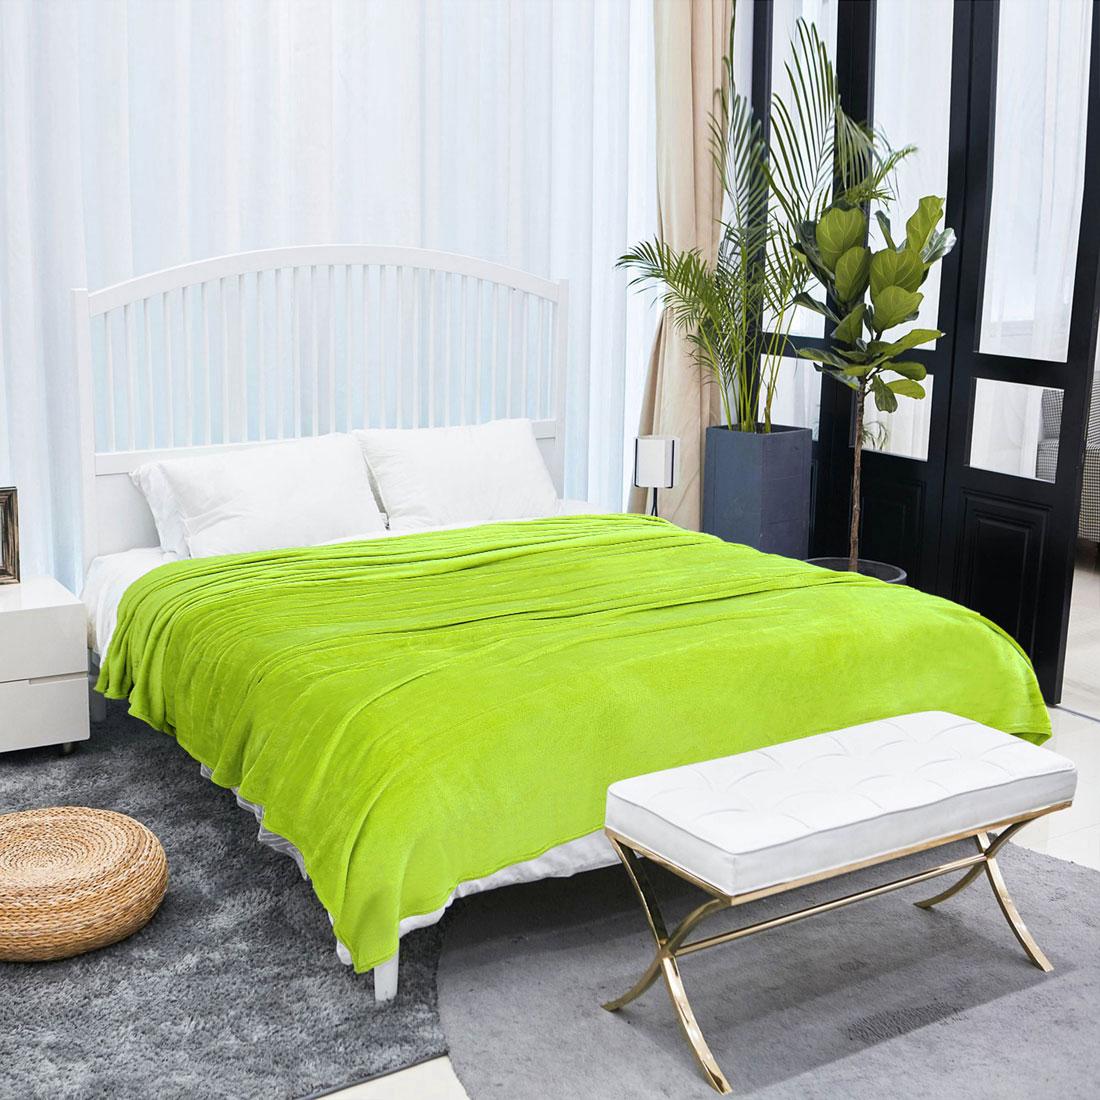 Microfiber Flannel Fleece Blanket Plush Throw Lime Green Twin/Full/Queen